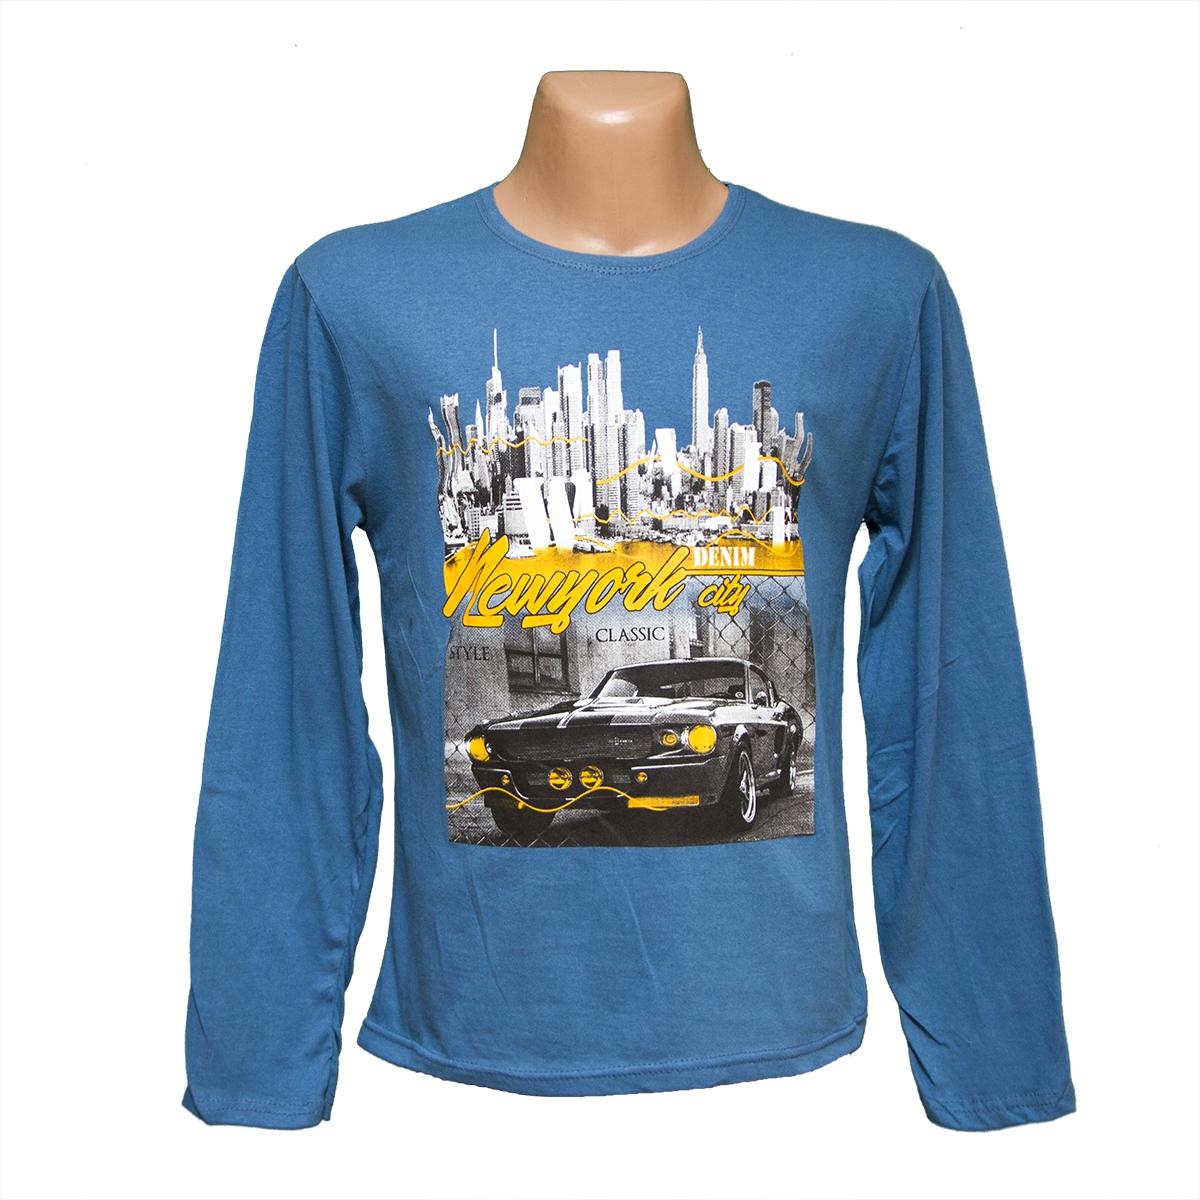 0b2667d4fa9cd39 Мужские футболки с длинным рукавом баталы по низким ценам 7907-4 ...